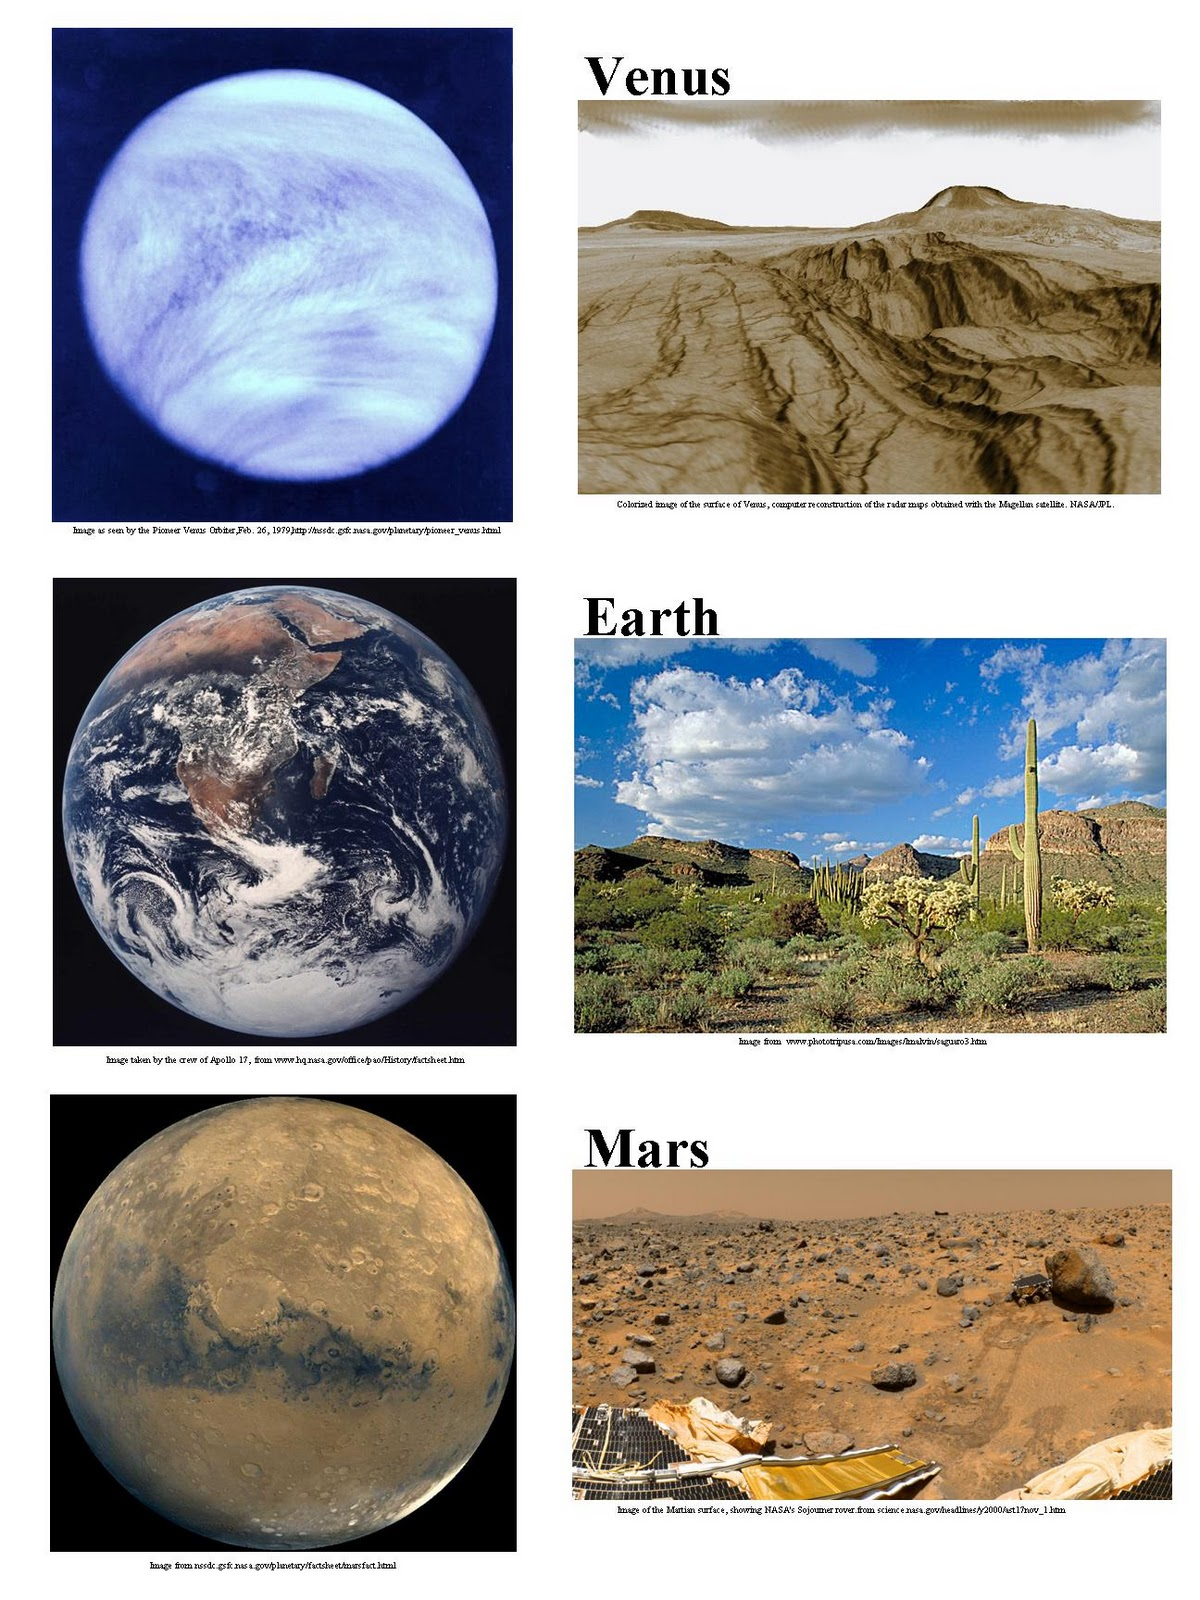 mars and planet venus atmosphere - photo #6